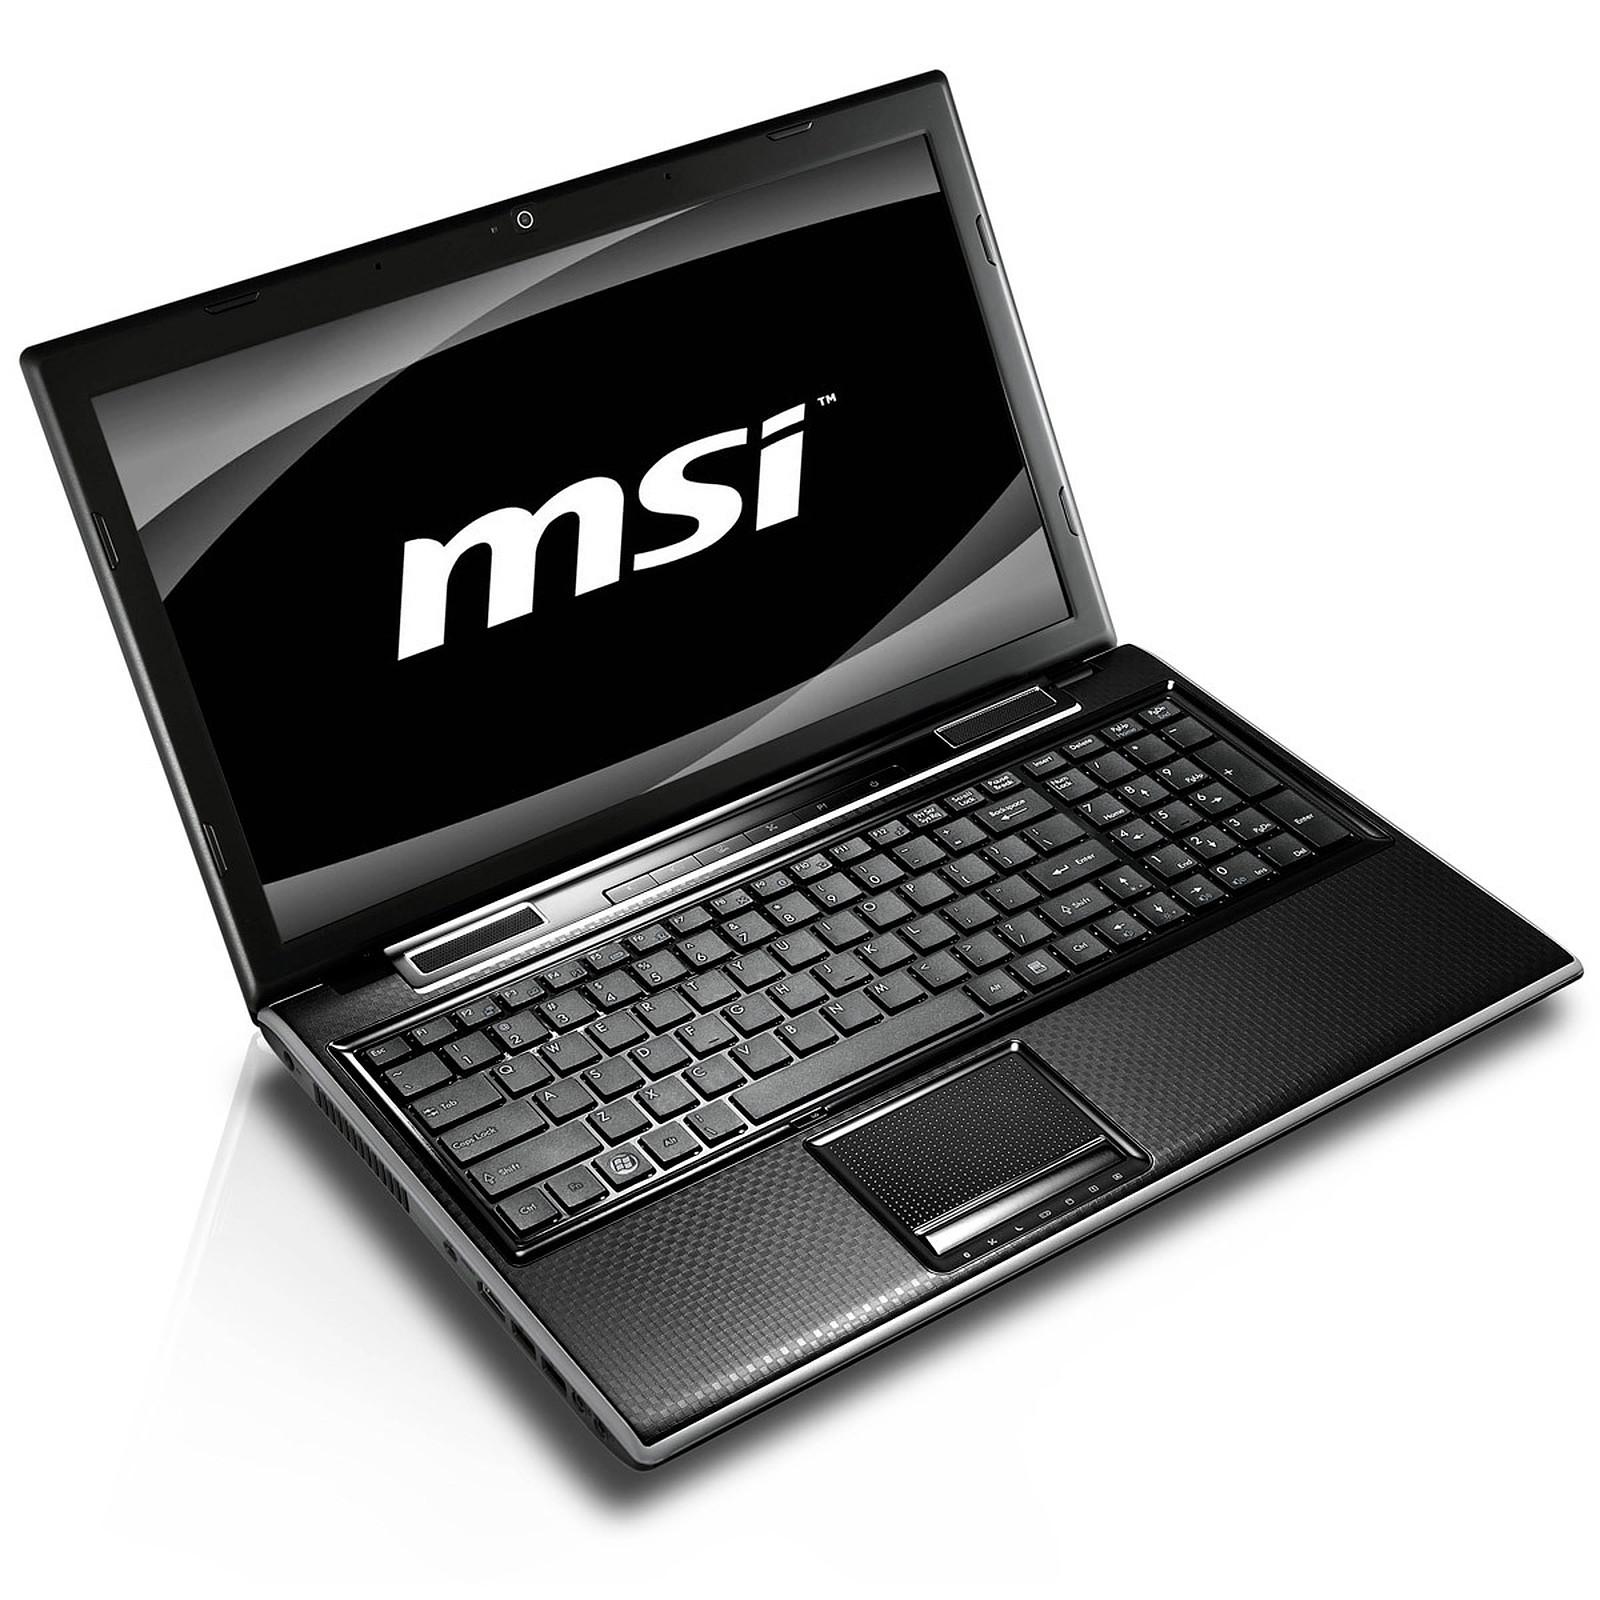 MSI FX600-030